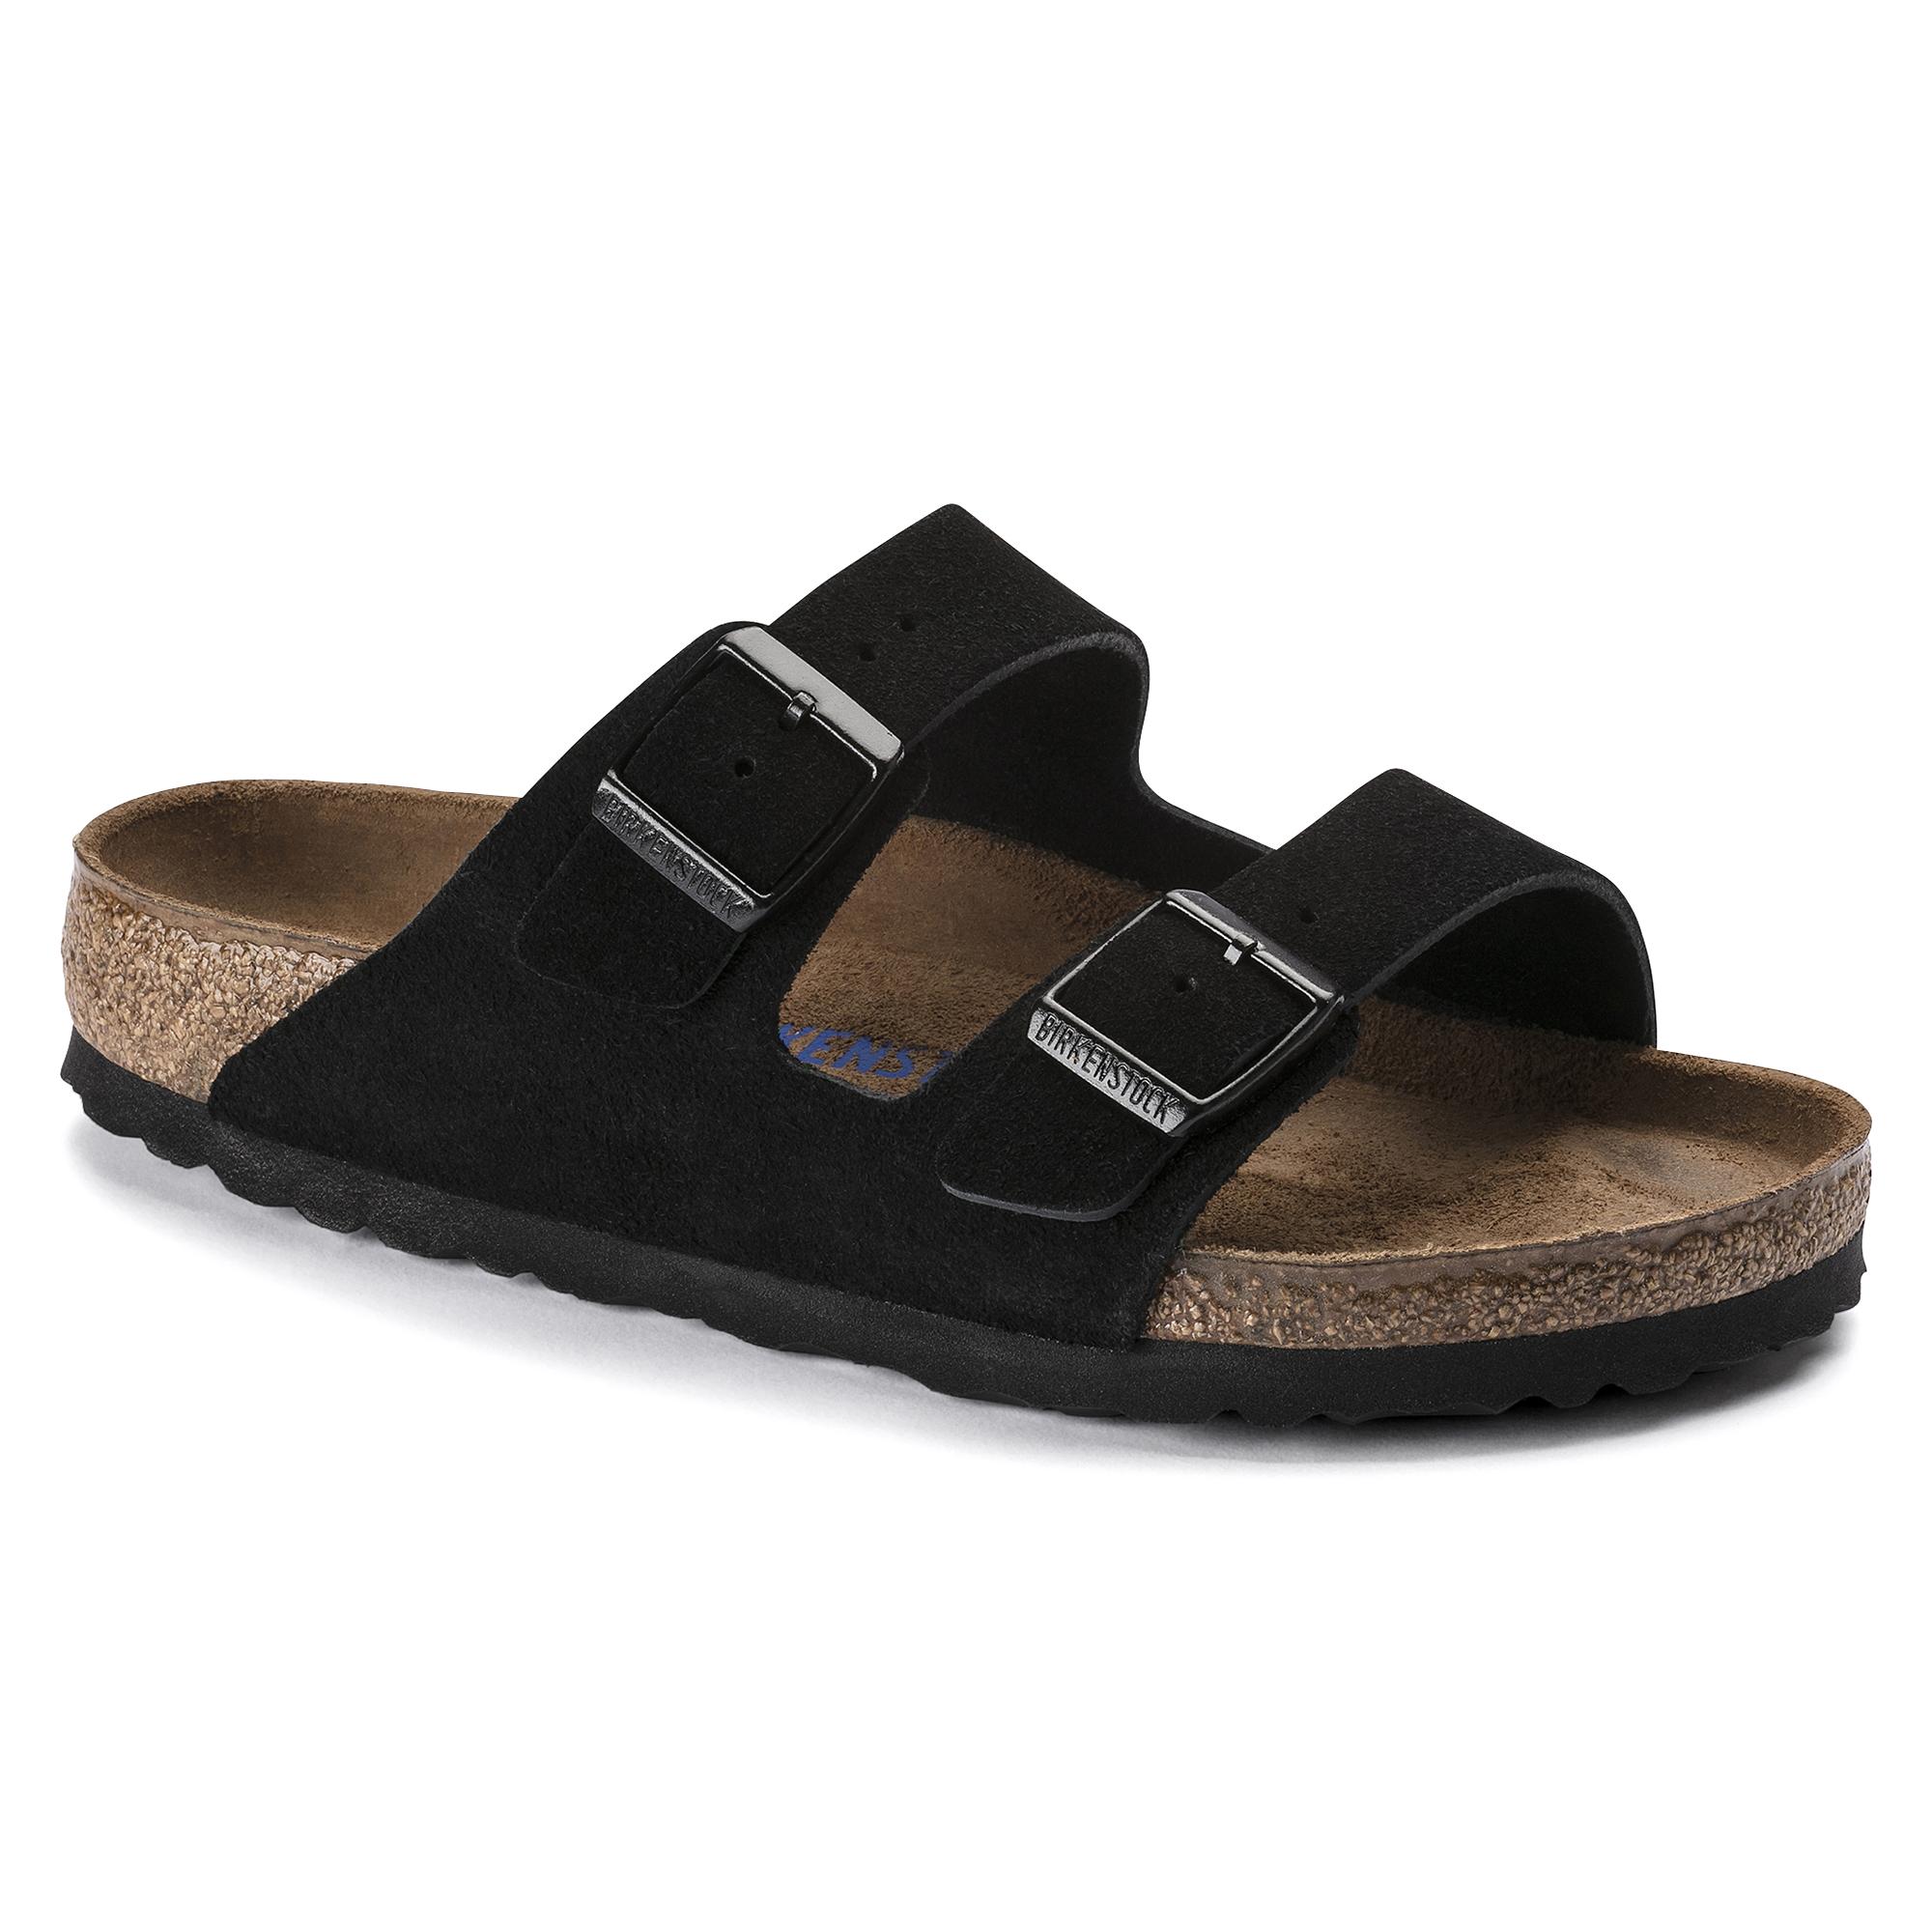 b820731e899709 Arizona Suede Leather Black